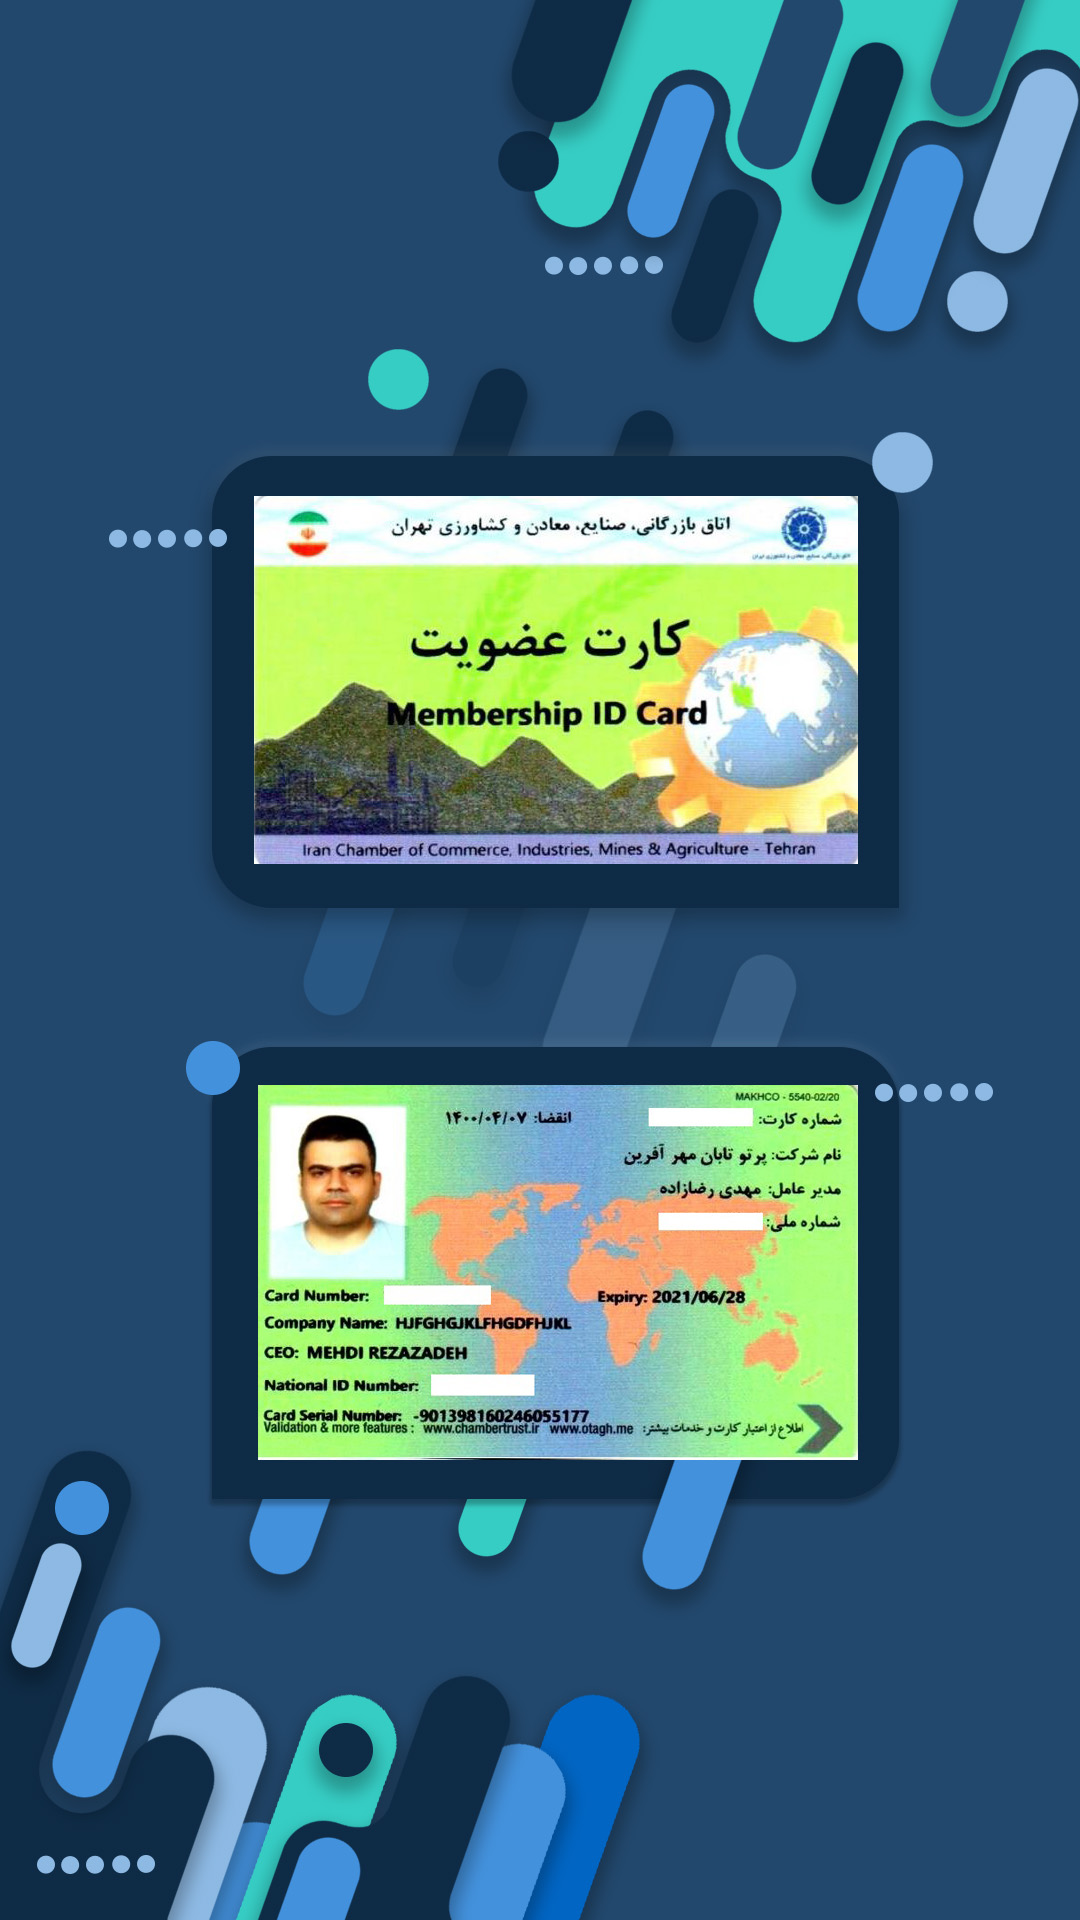 mahan-card-joind-.4-3999